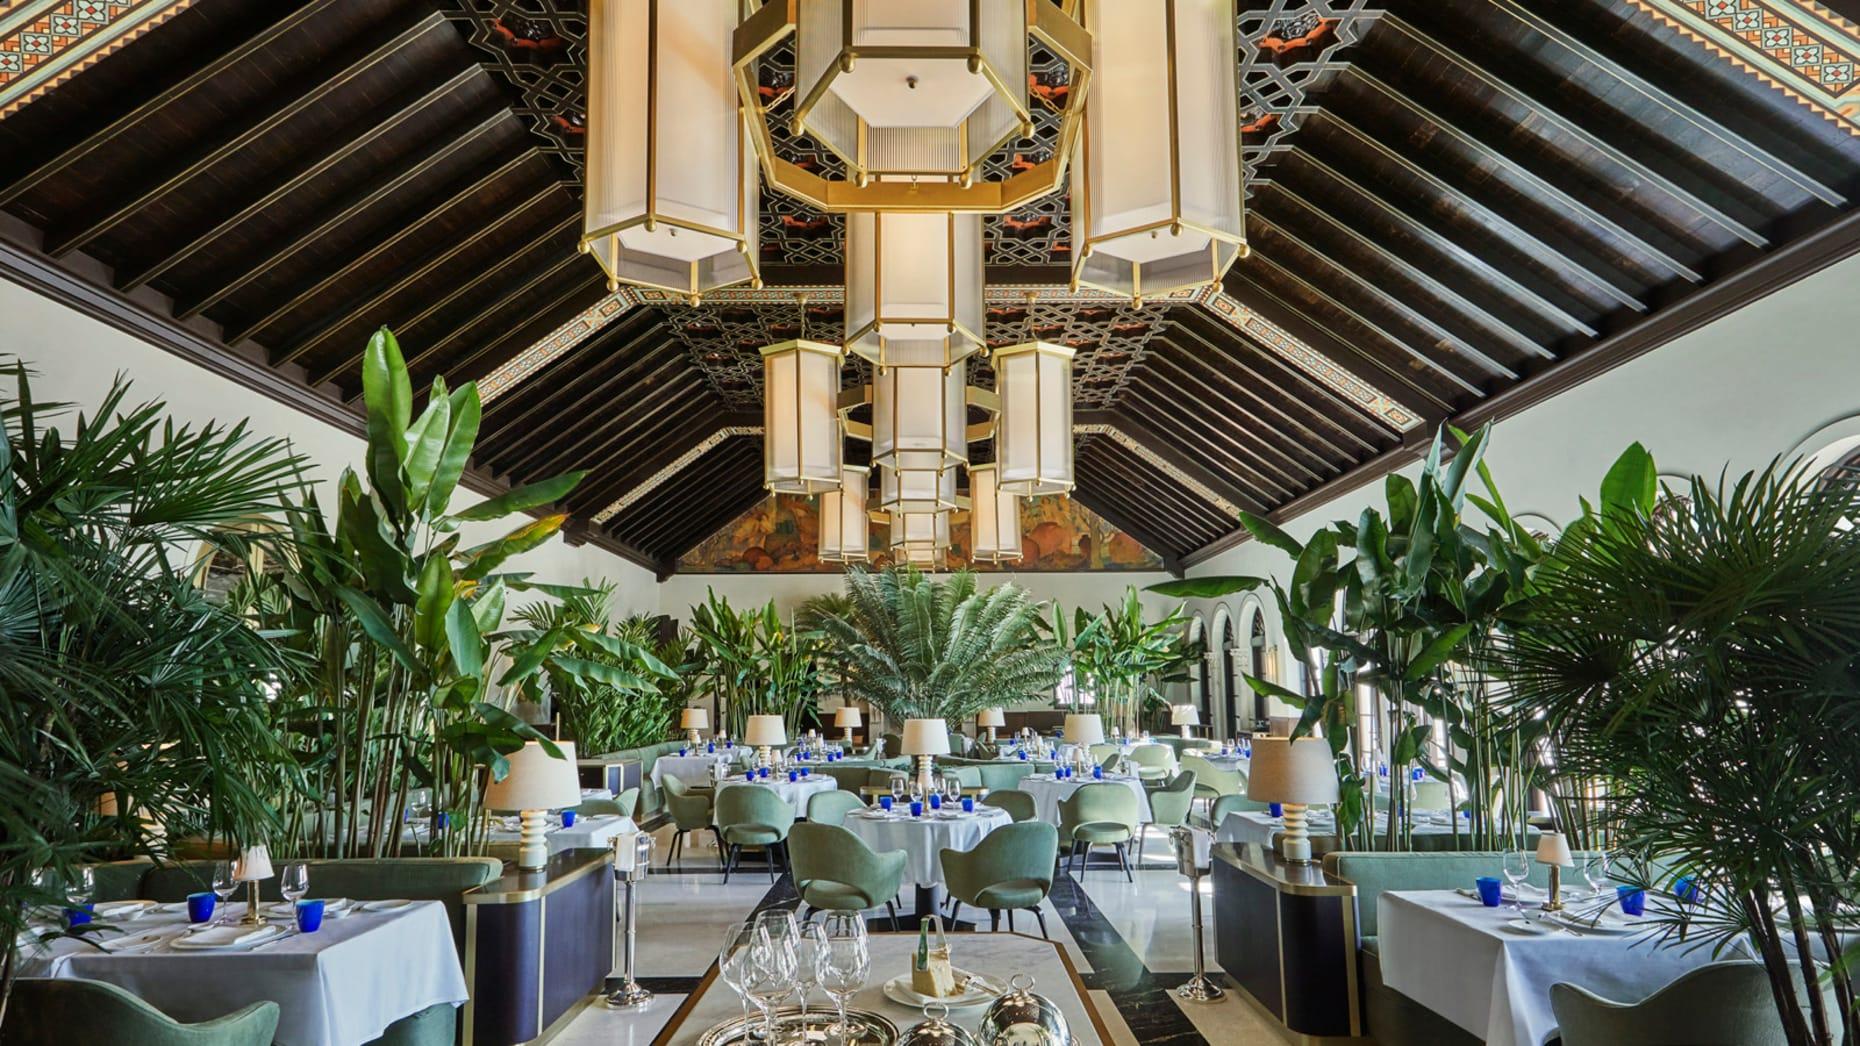 four seasons hotel at the surf club - Miami Beach, Florida, USA